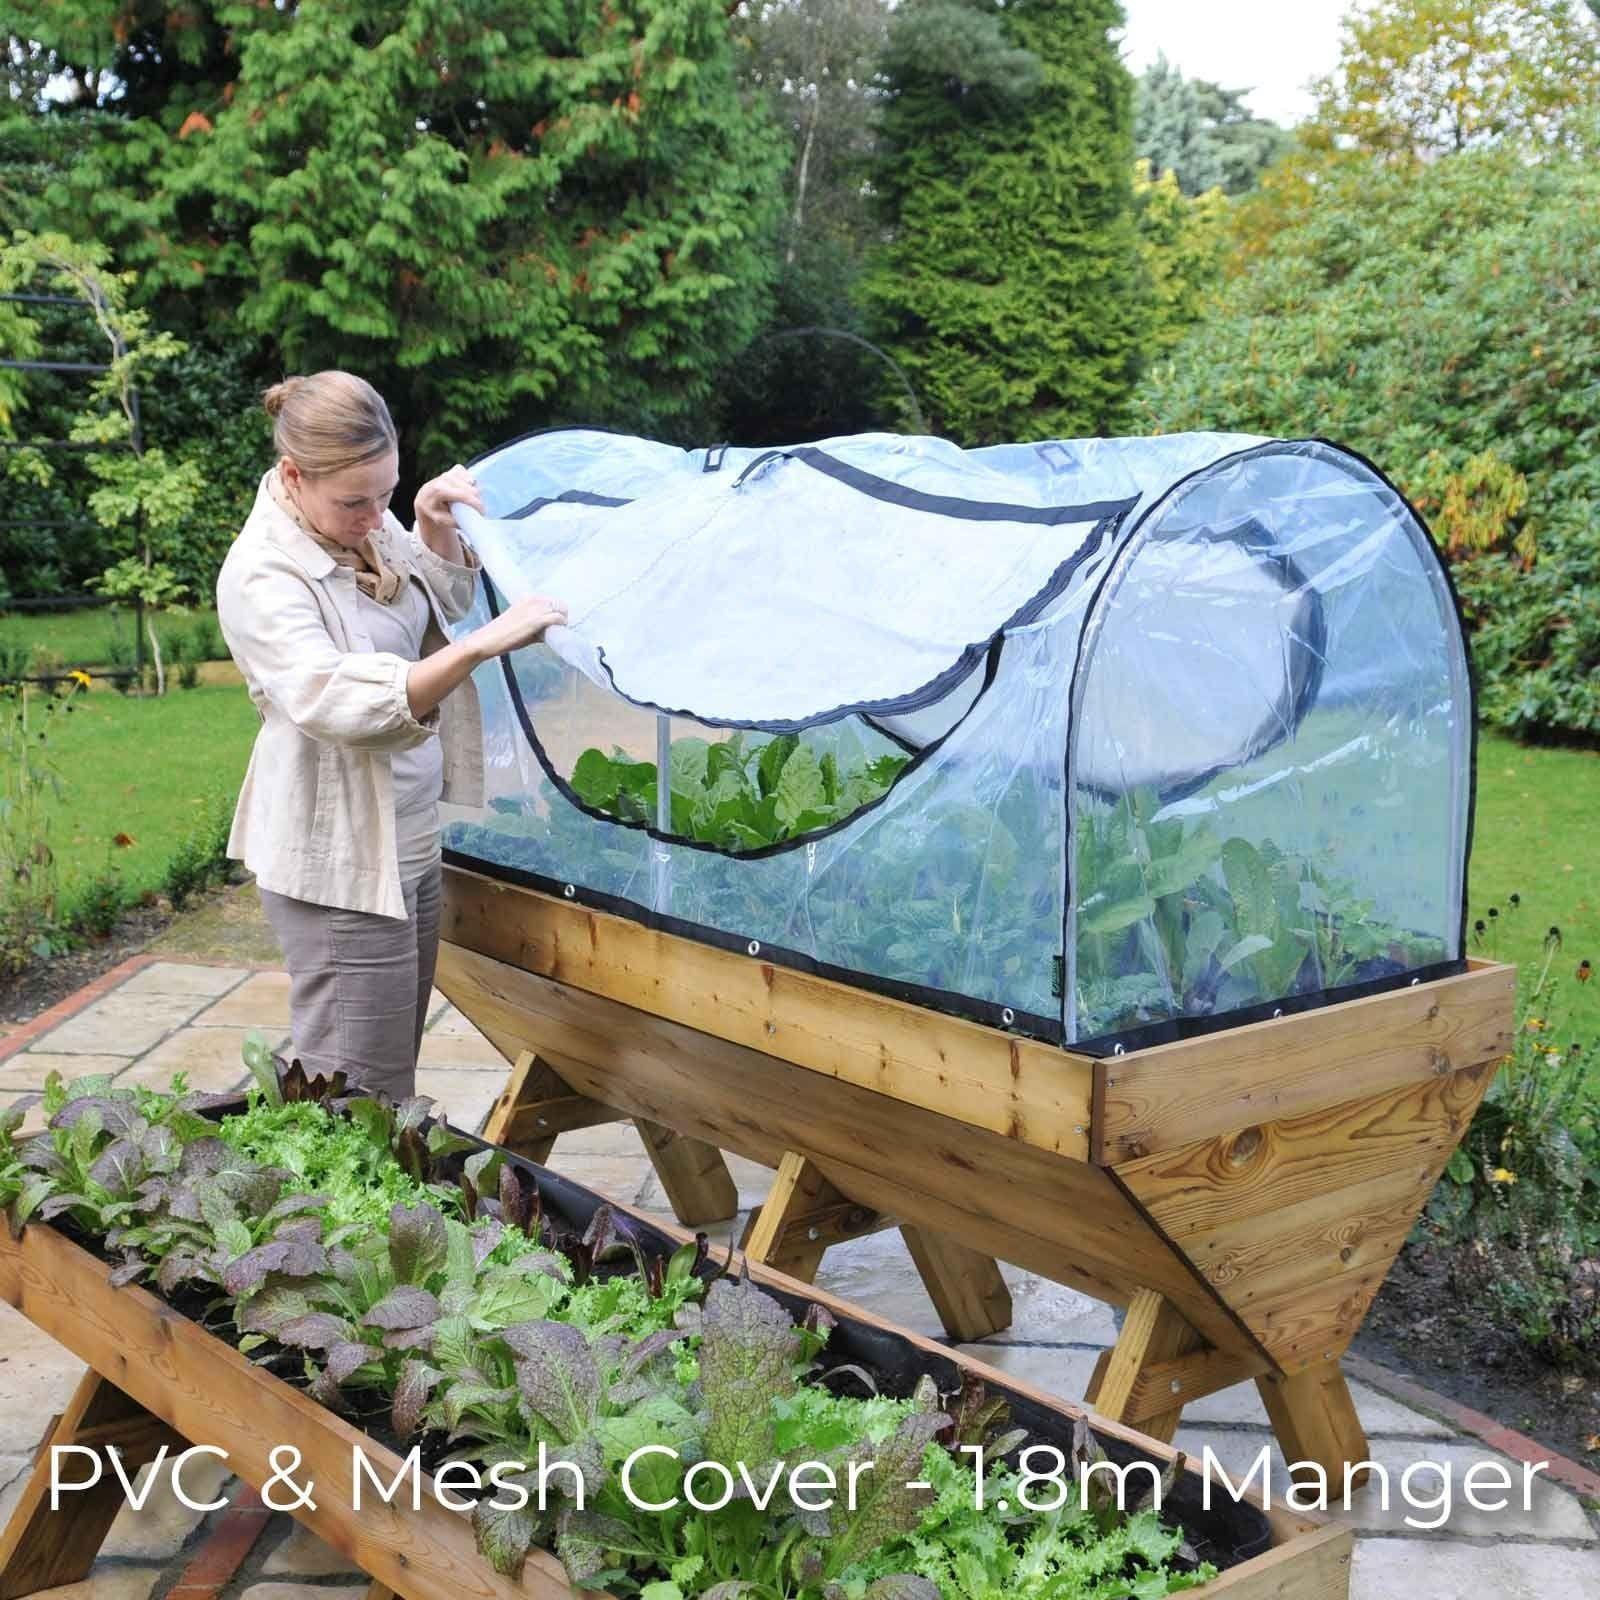 Maxi Manger Hoop & Cover Kits Harrod Horticultural UK in